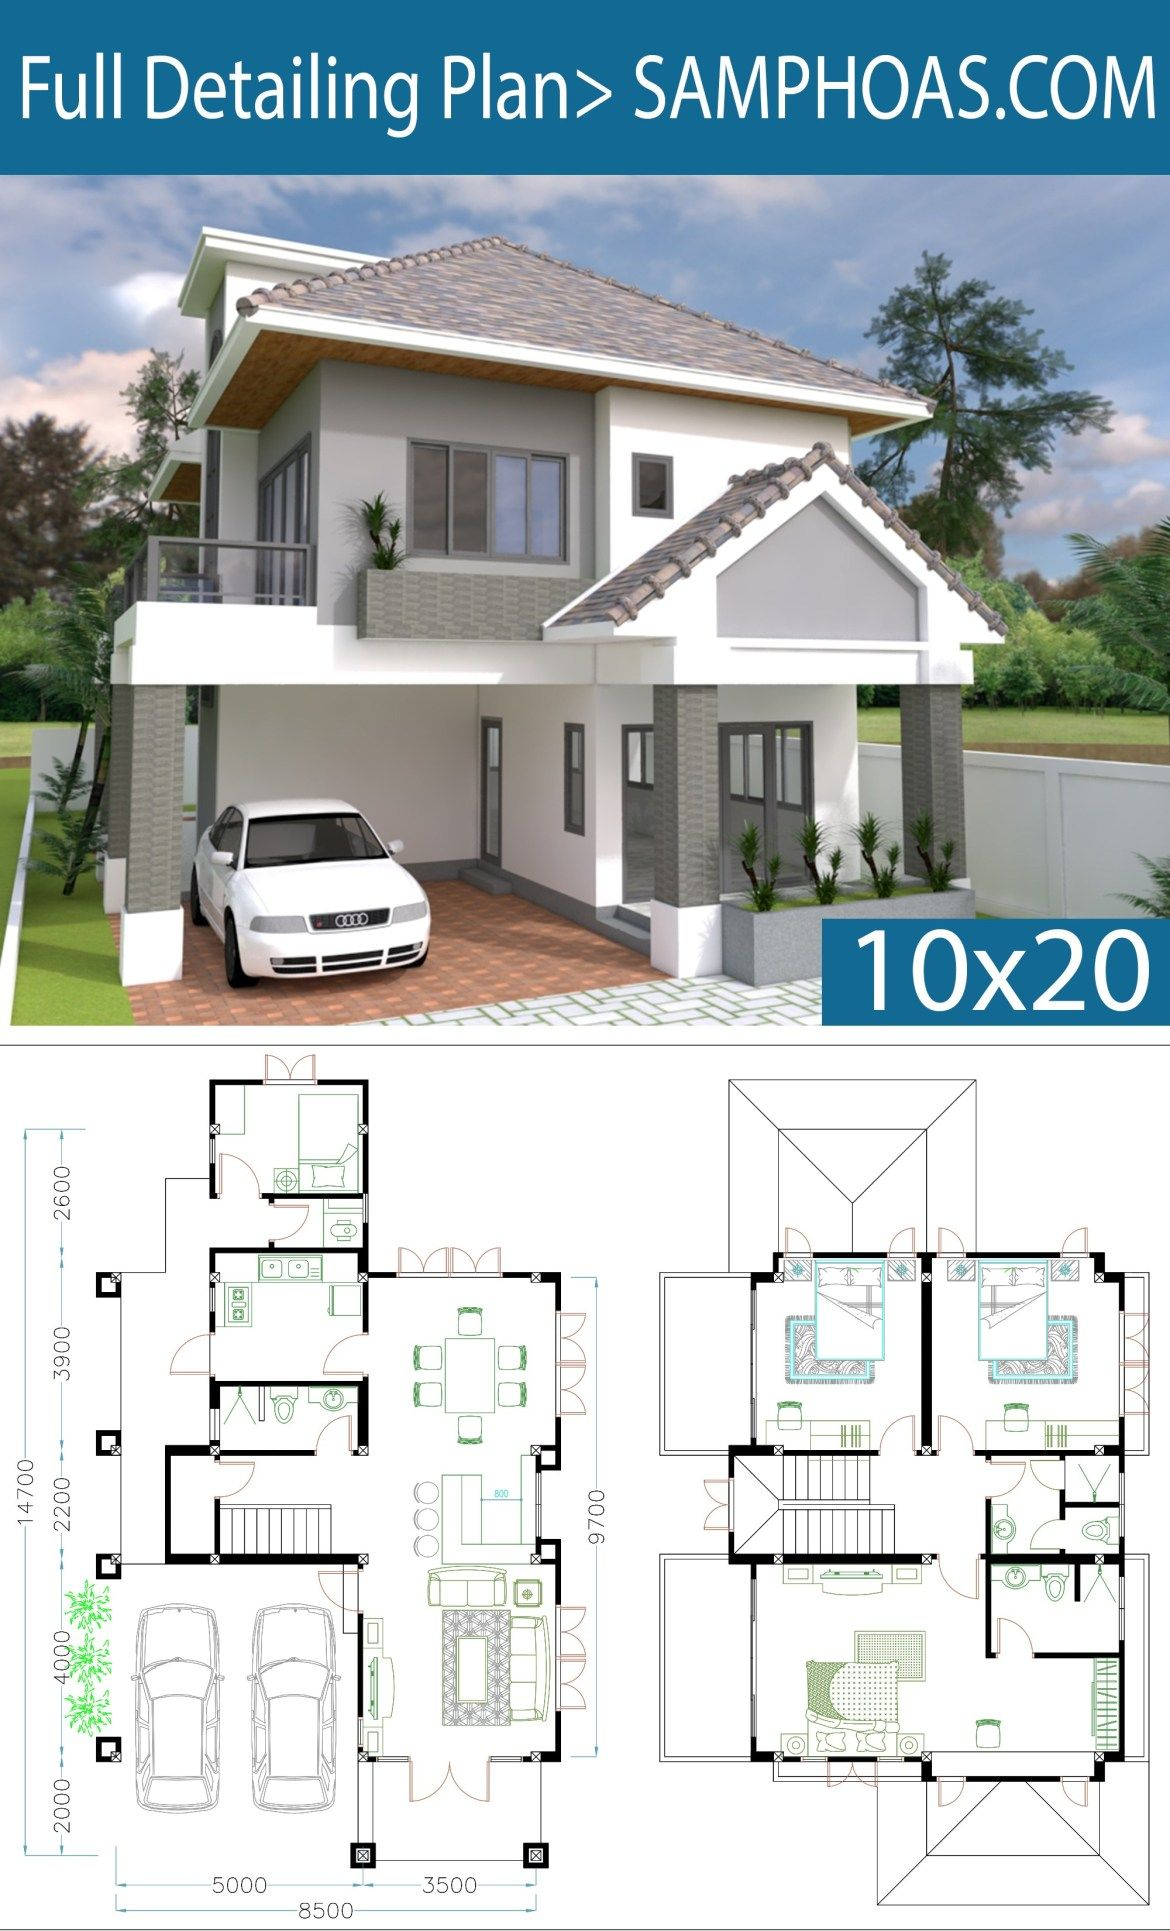 4 Bedrooms Home Plan 8 5x14 7m Samphoas Plansearch House Plans Duplex House Plans Modern House Plans